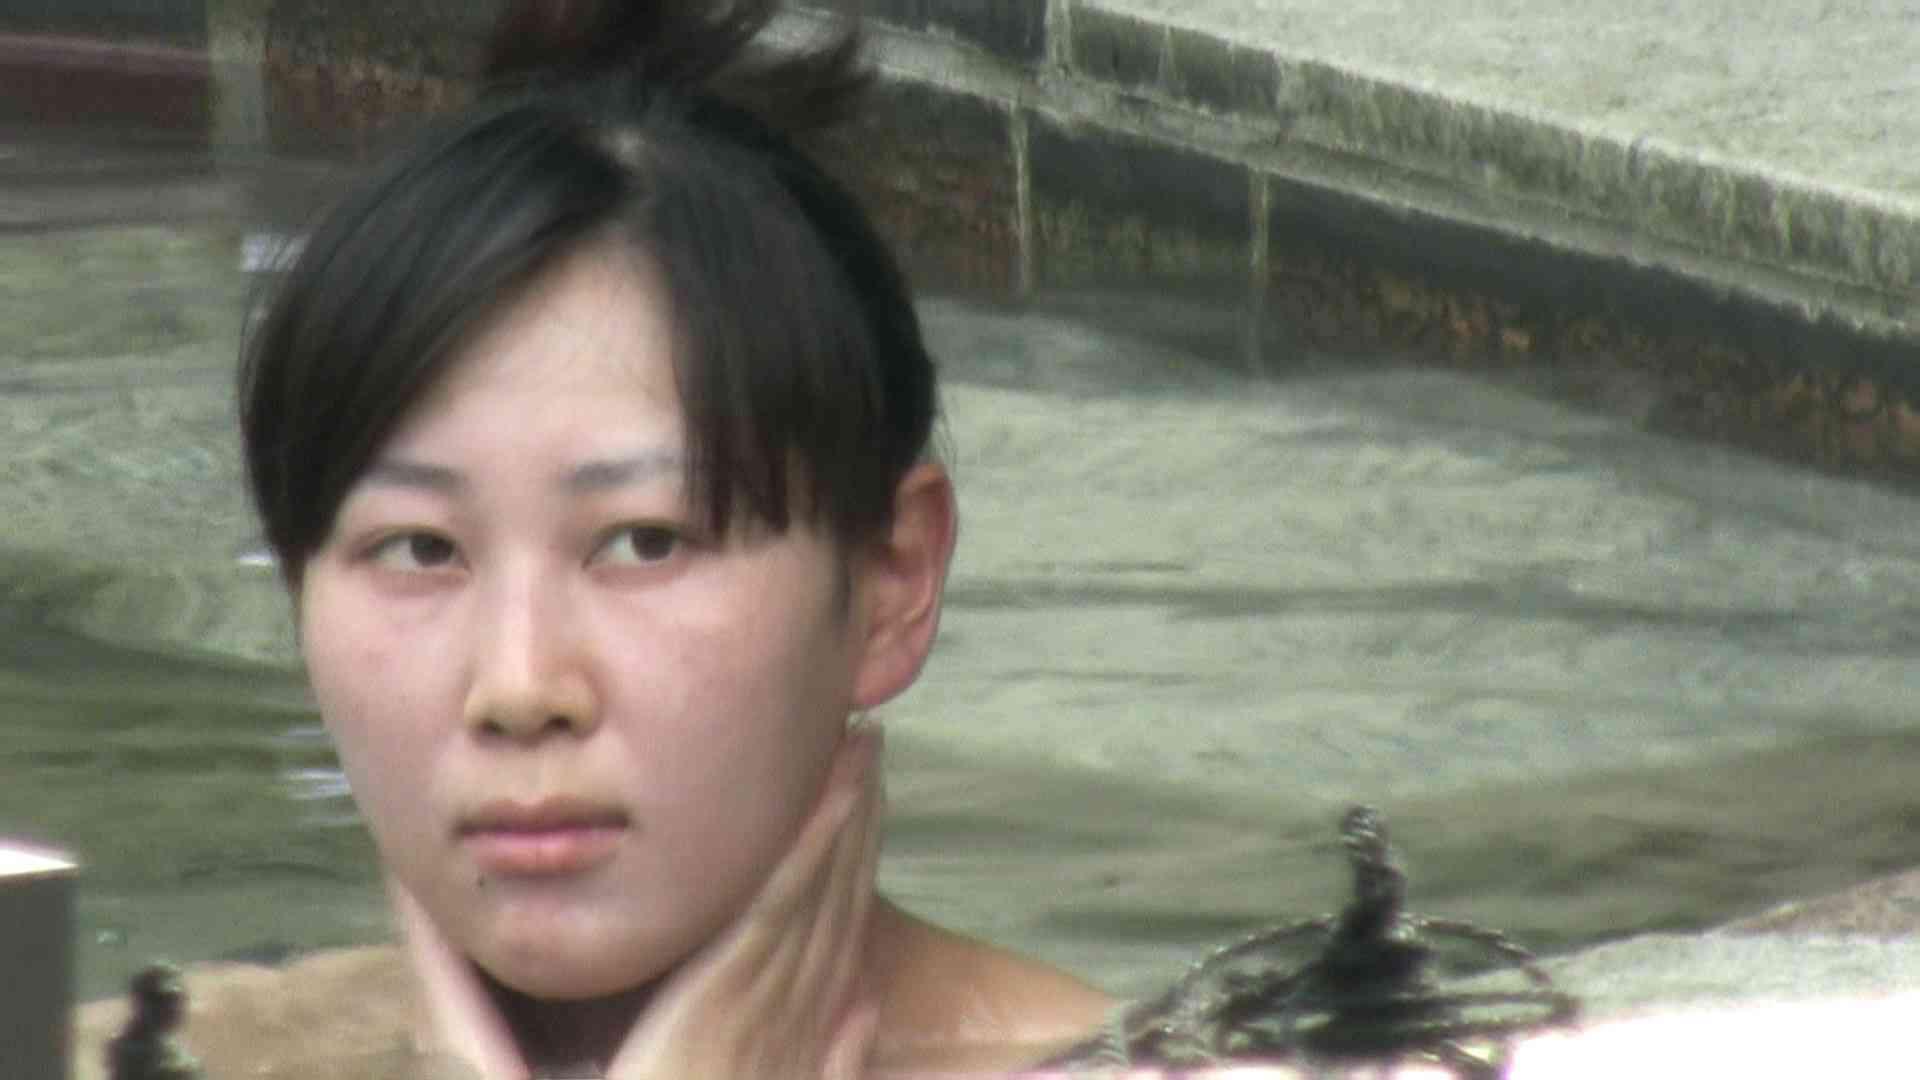 Aquaな露天風呂Vol.665 HなOL   盗撮  104pic 13